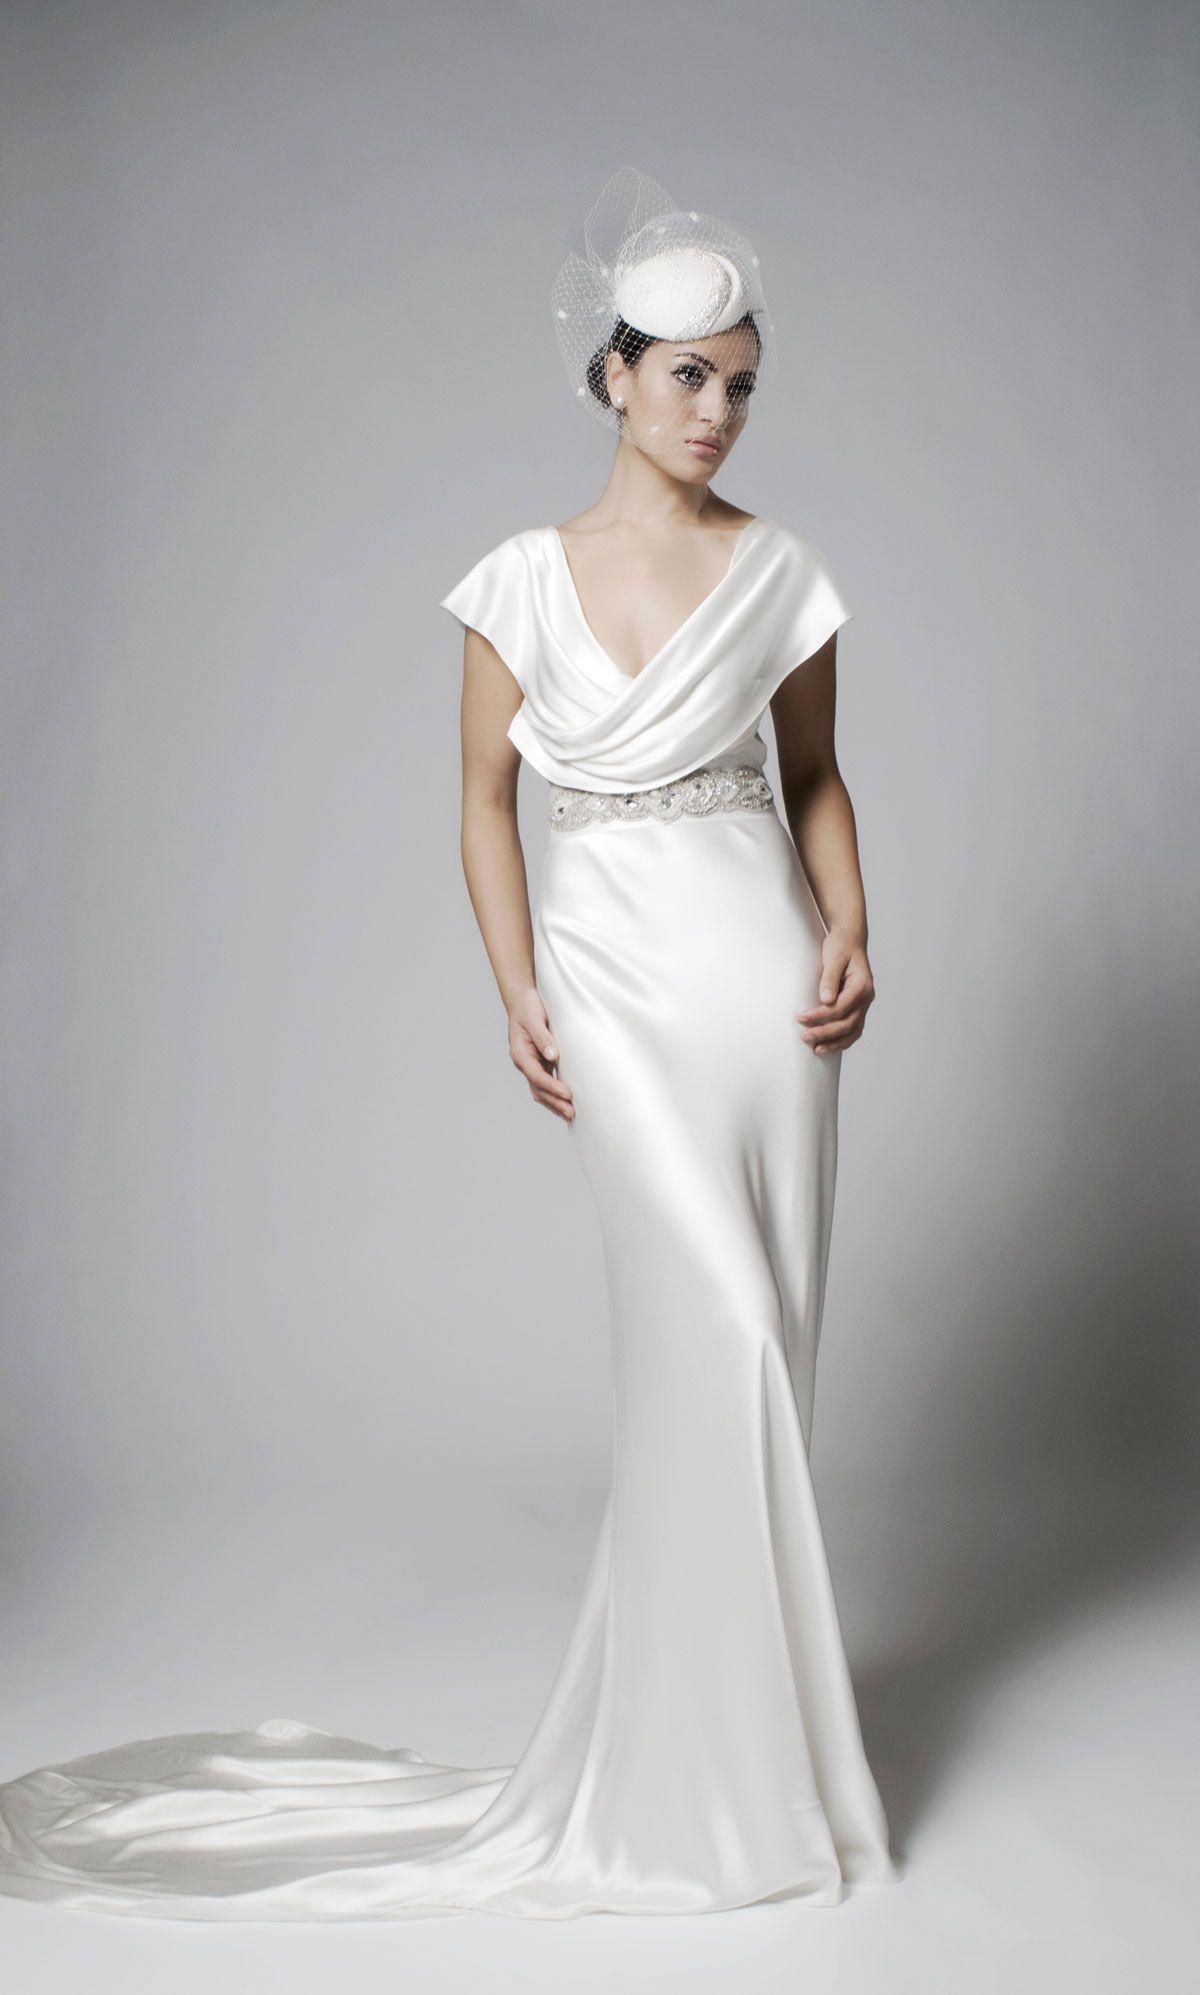 Sanyukta Shrestha Bridal Couture 2012 - Eco couture designer for ...